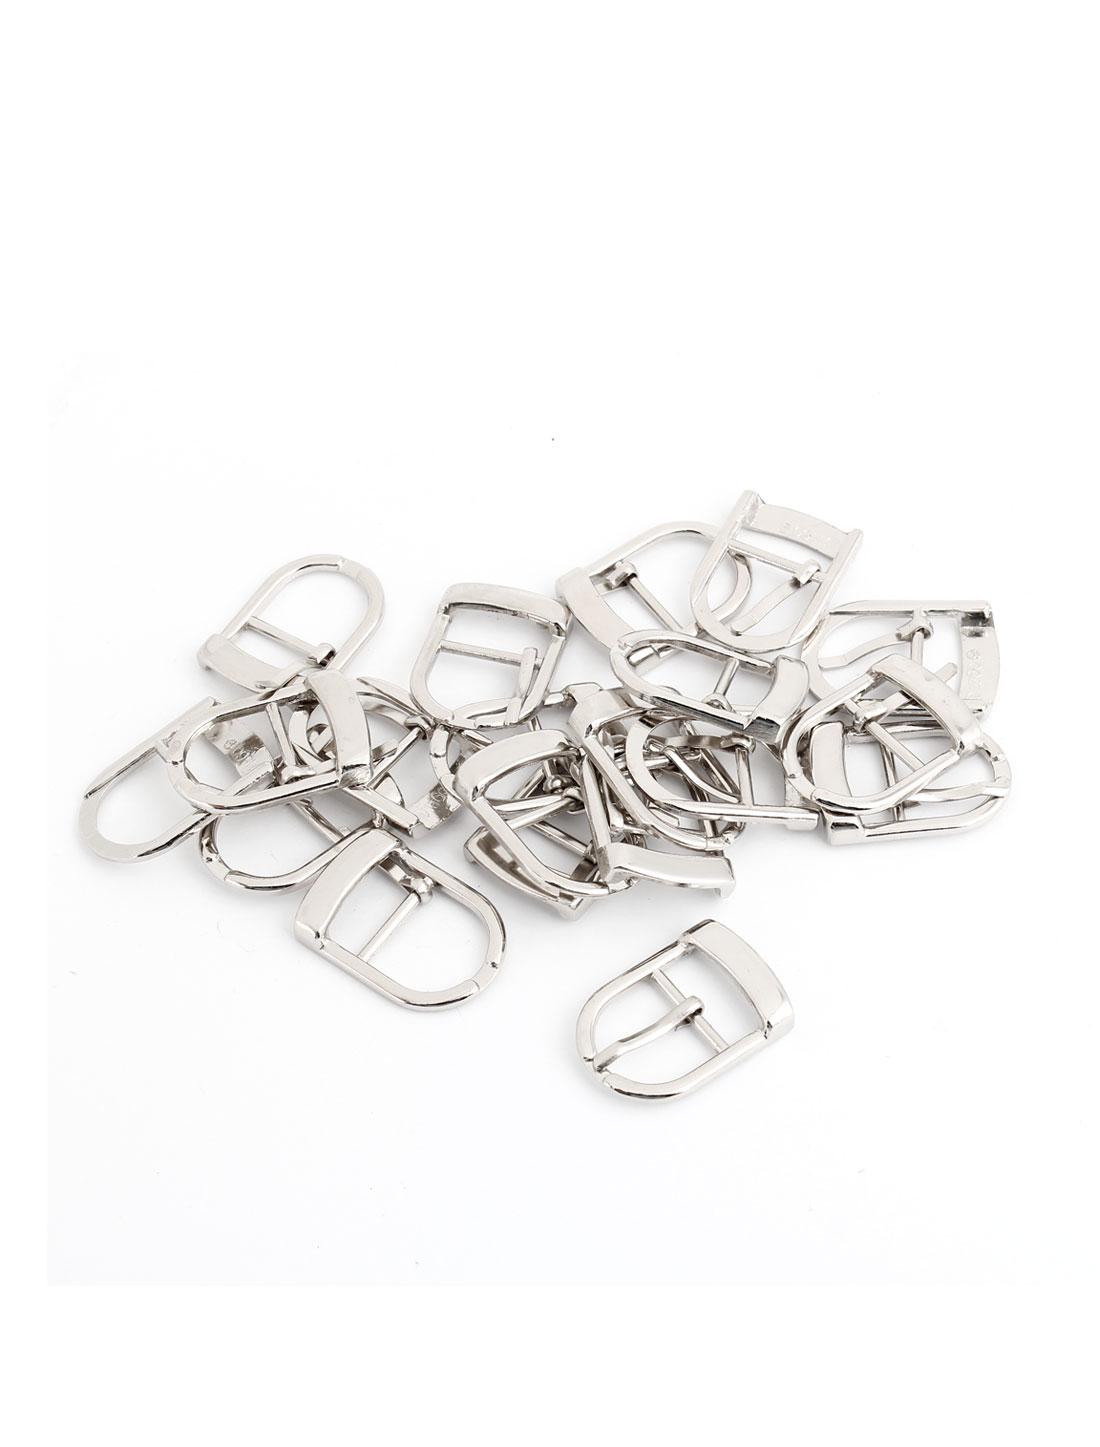 20 Pcs Silver Tone Metallic Shoes Single Prong Pin Buckles